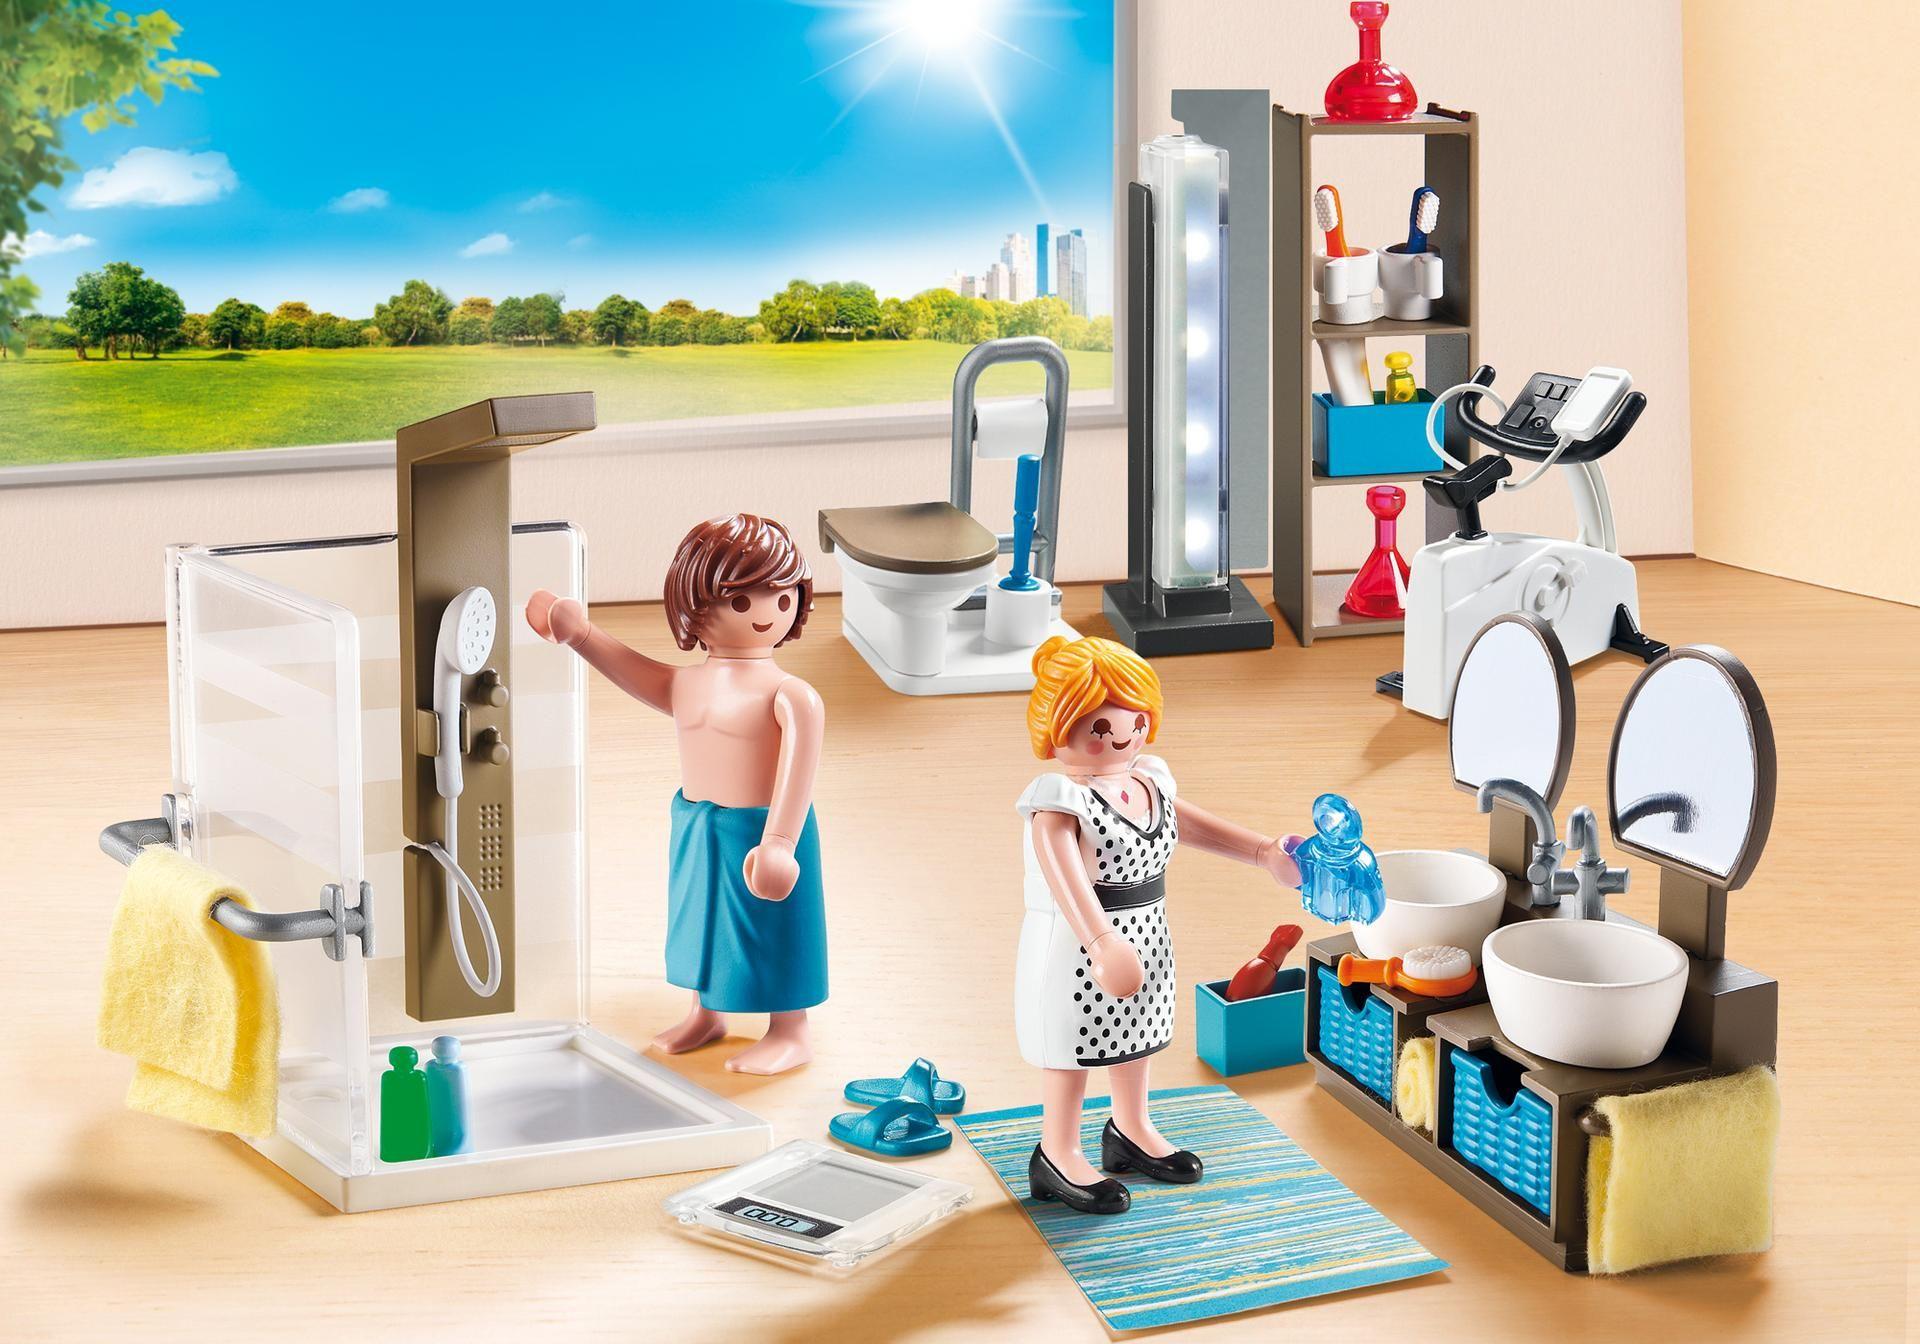 Pin von Ela auf Playmobil, ♡♡♡, I love you, ®™ | Playmobil ...